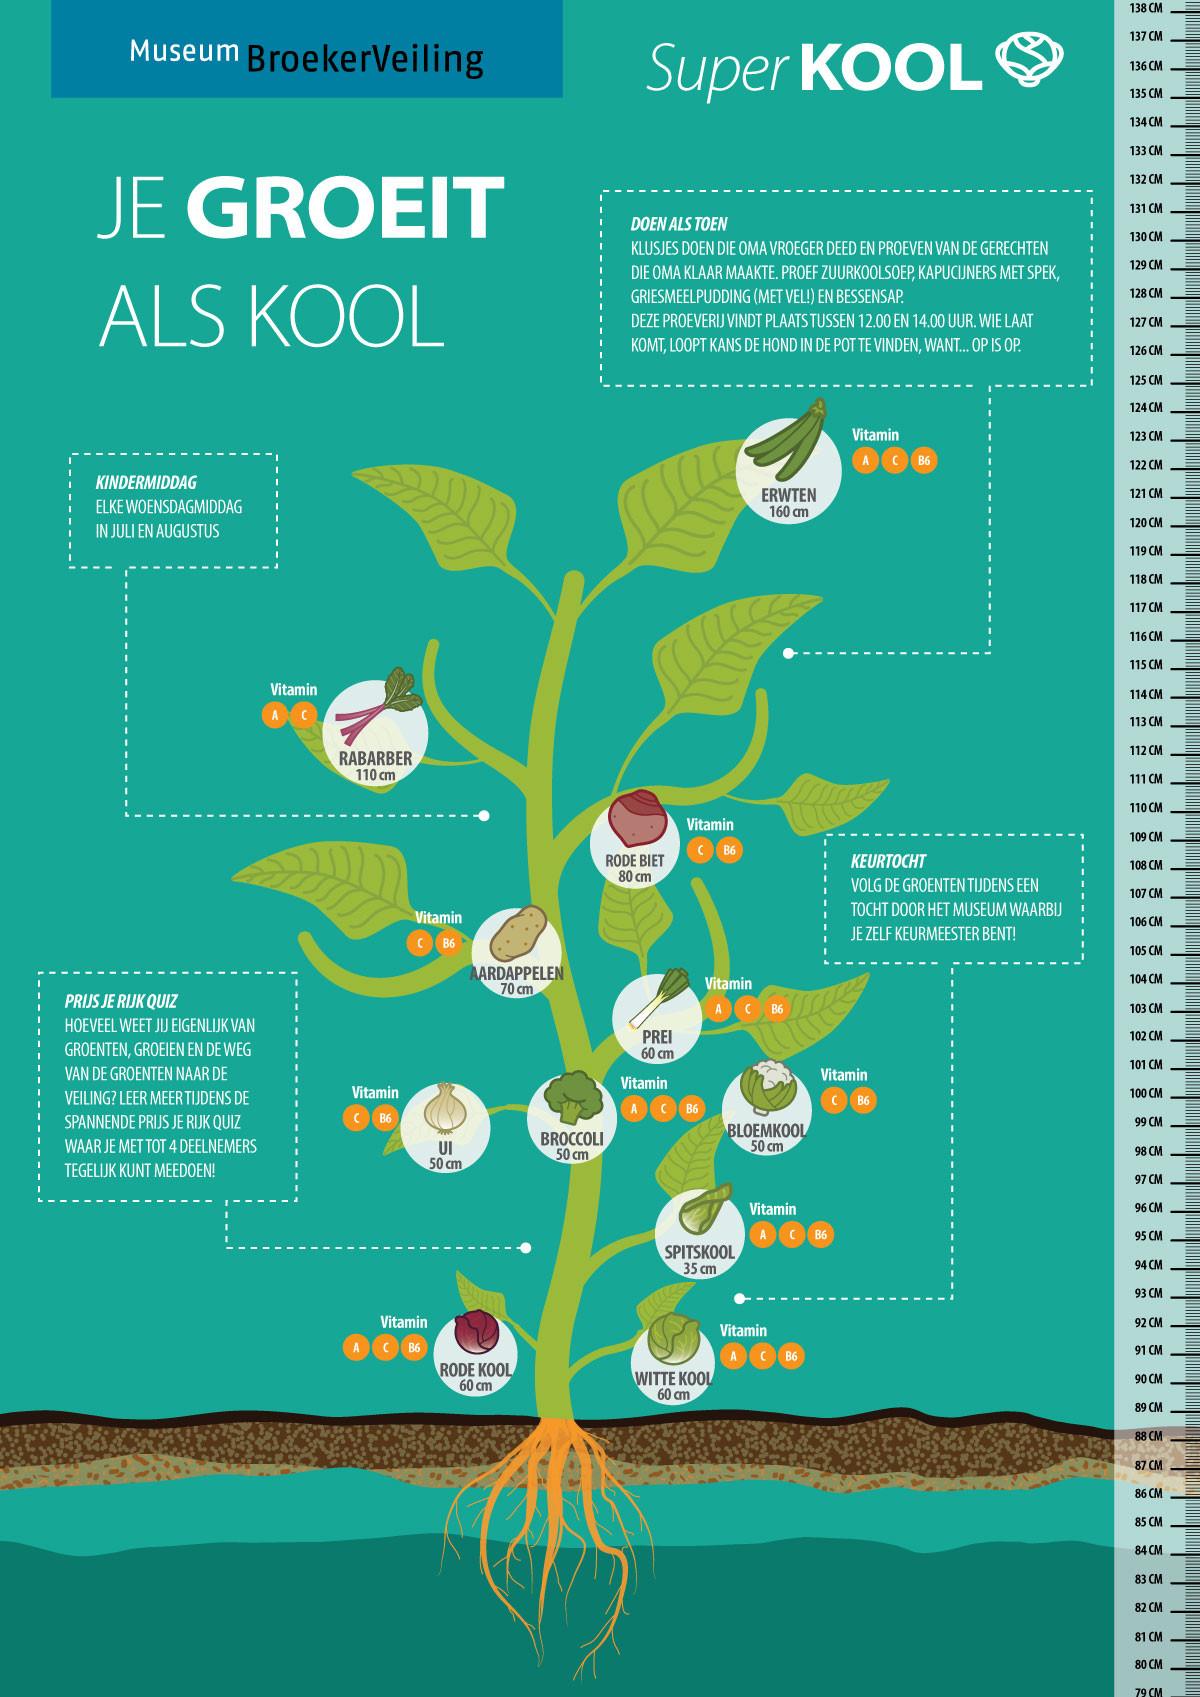 SuperKOOL-kalender-A2-42x59cm.jpg